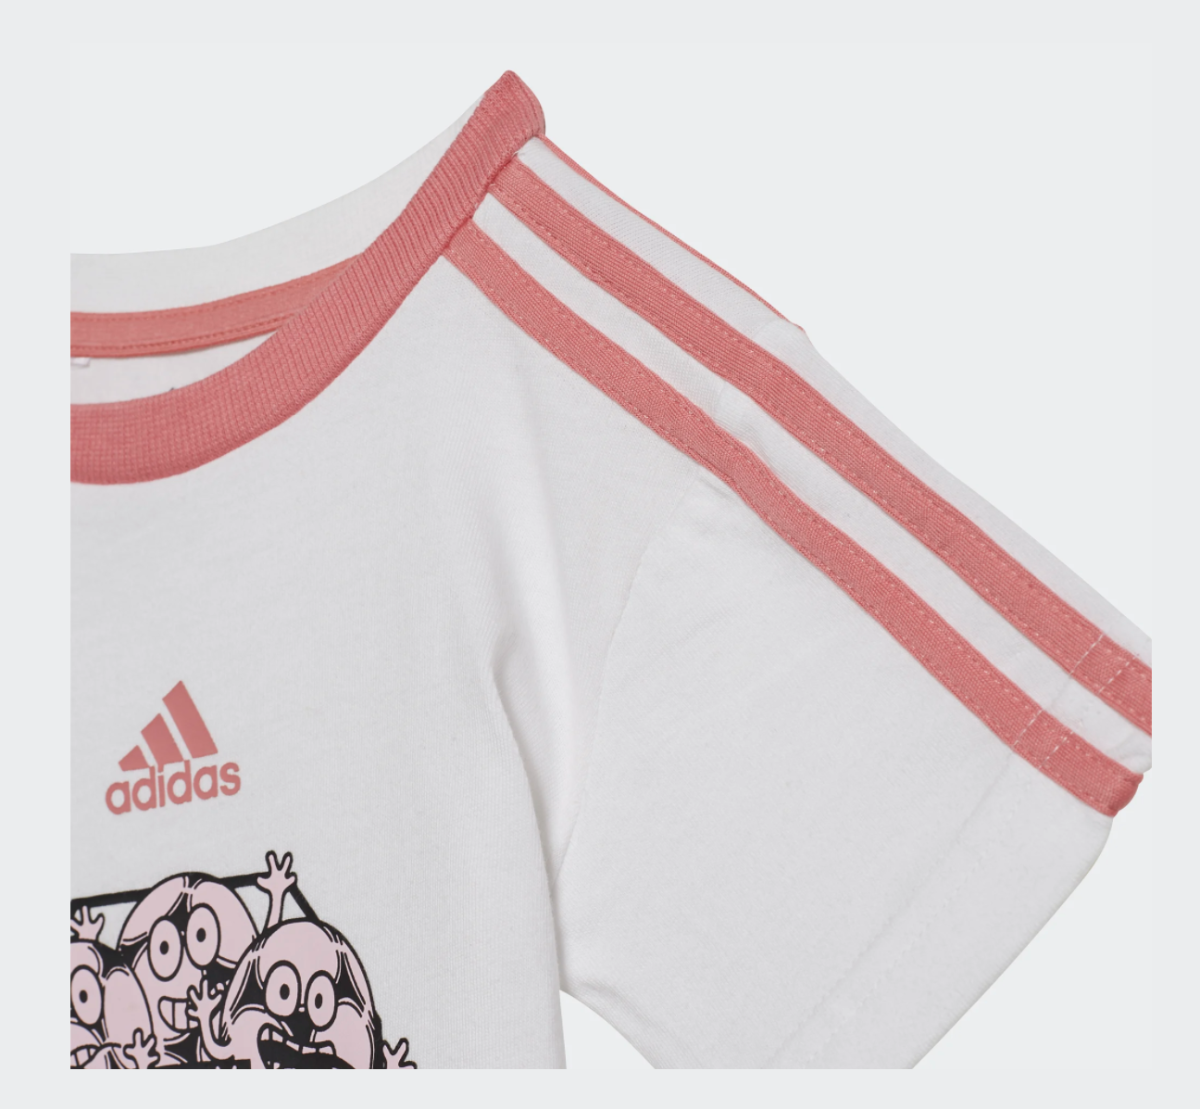 Rosa/Hvit Adidas 3S SP Sett